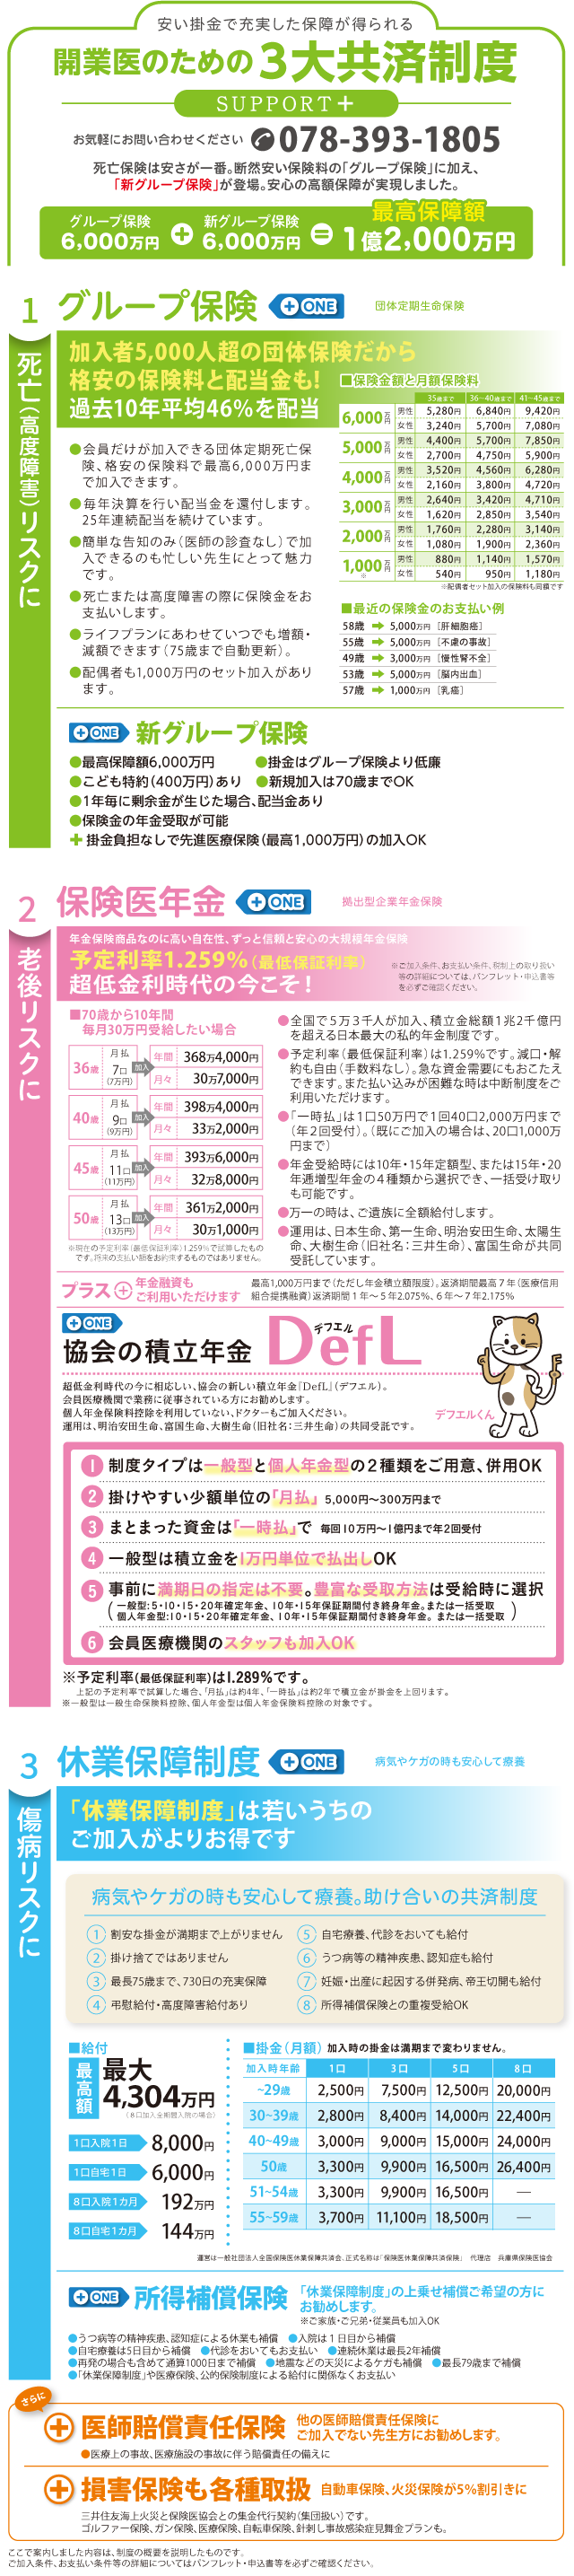 kyosai201907_detail_02.png